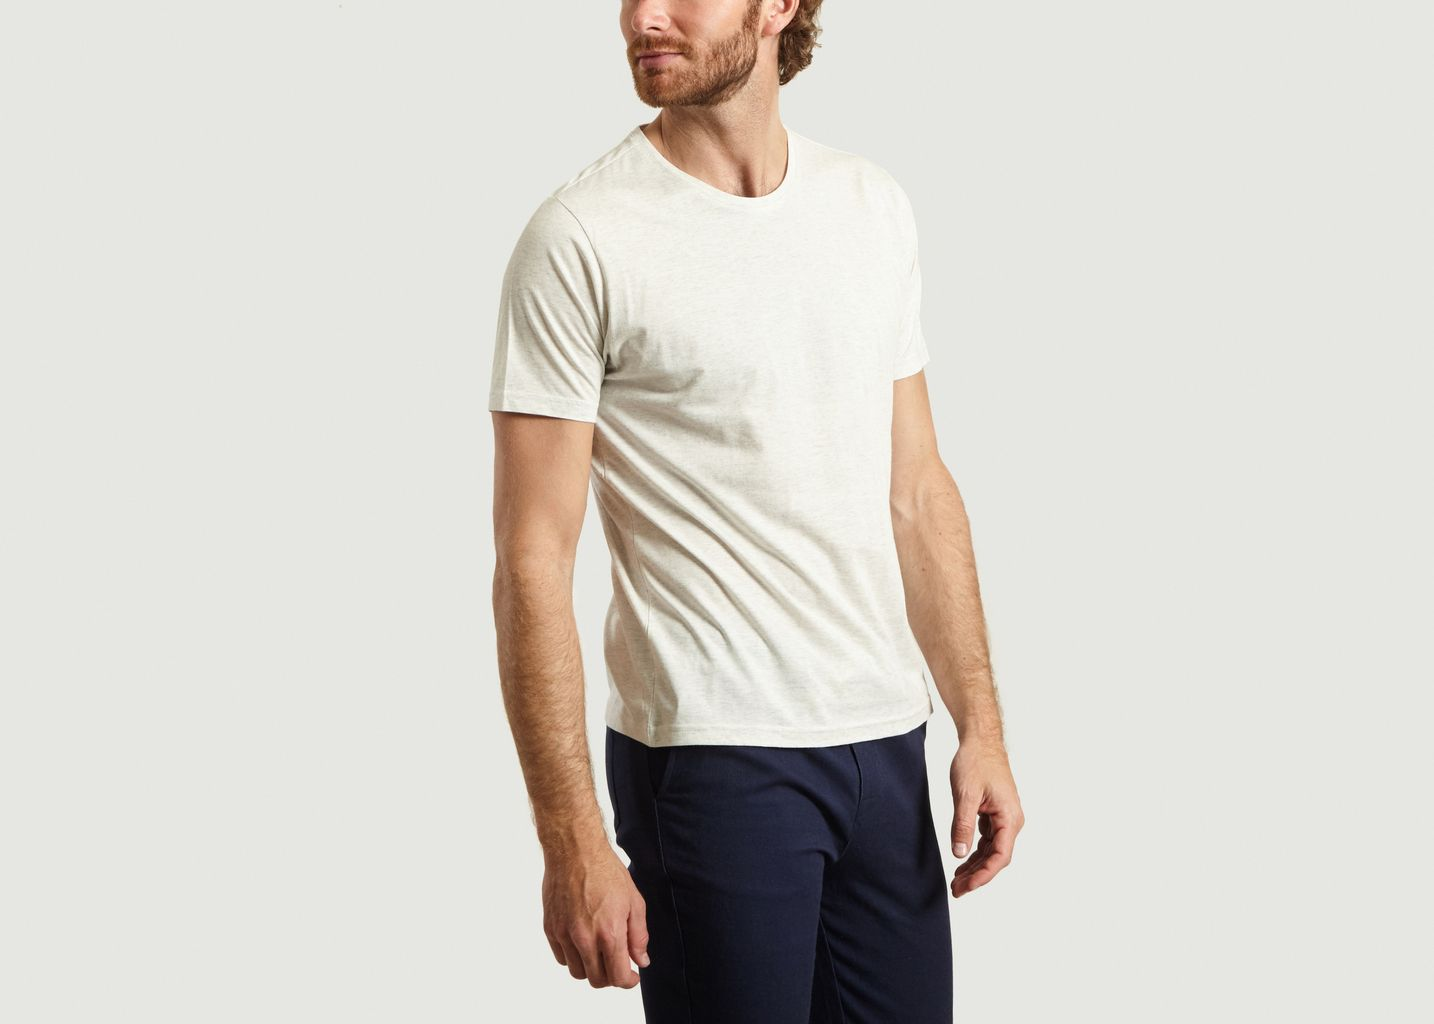 T-shirt One - JagVi